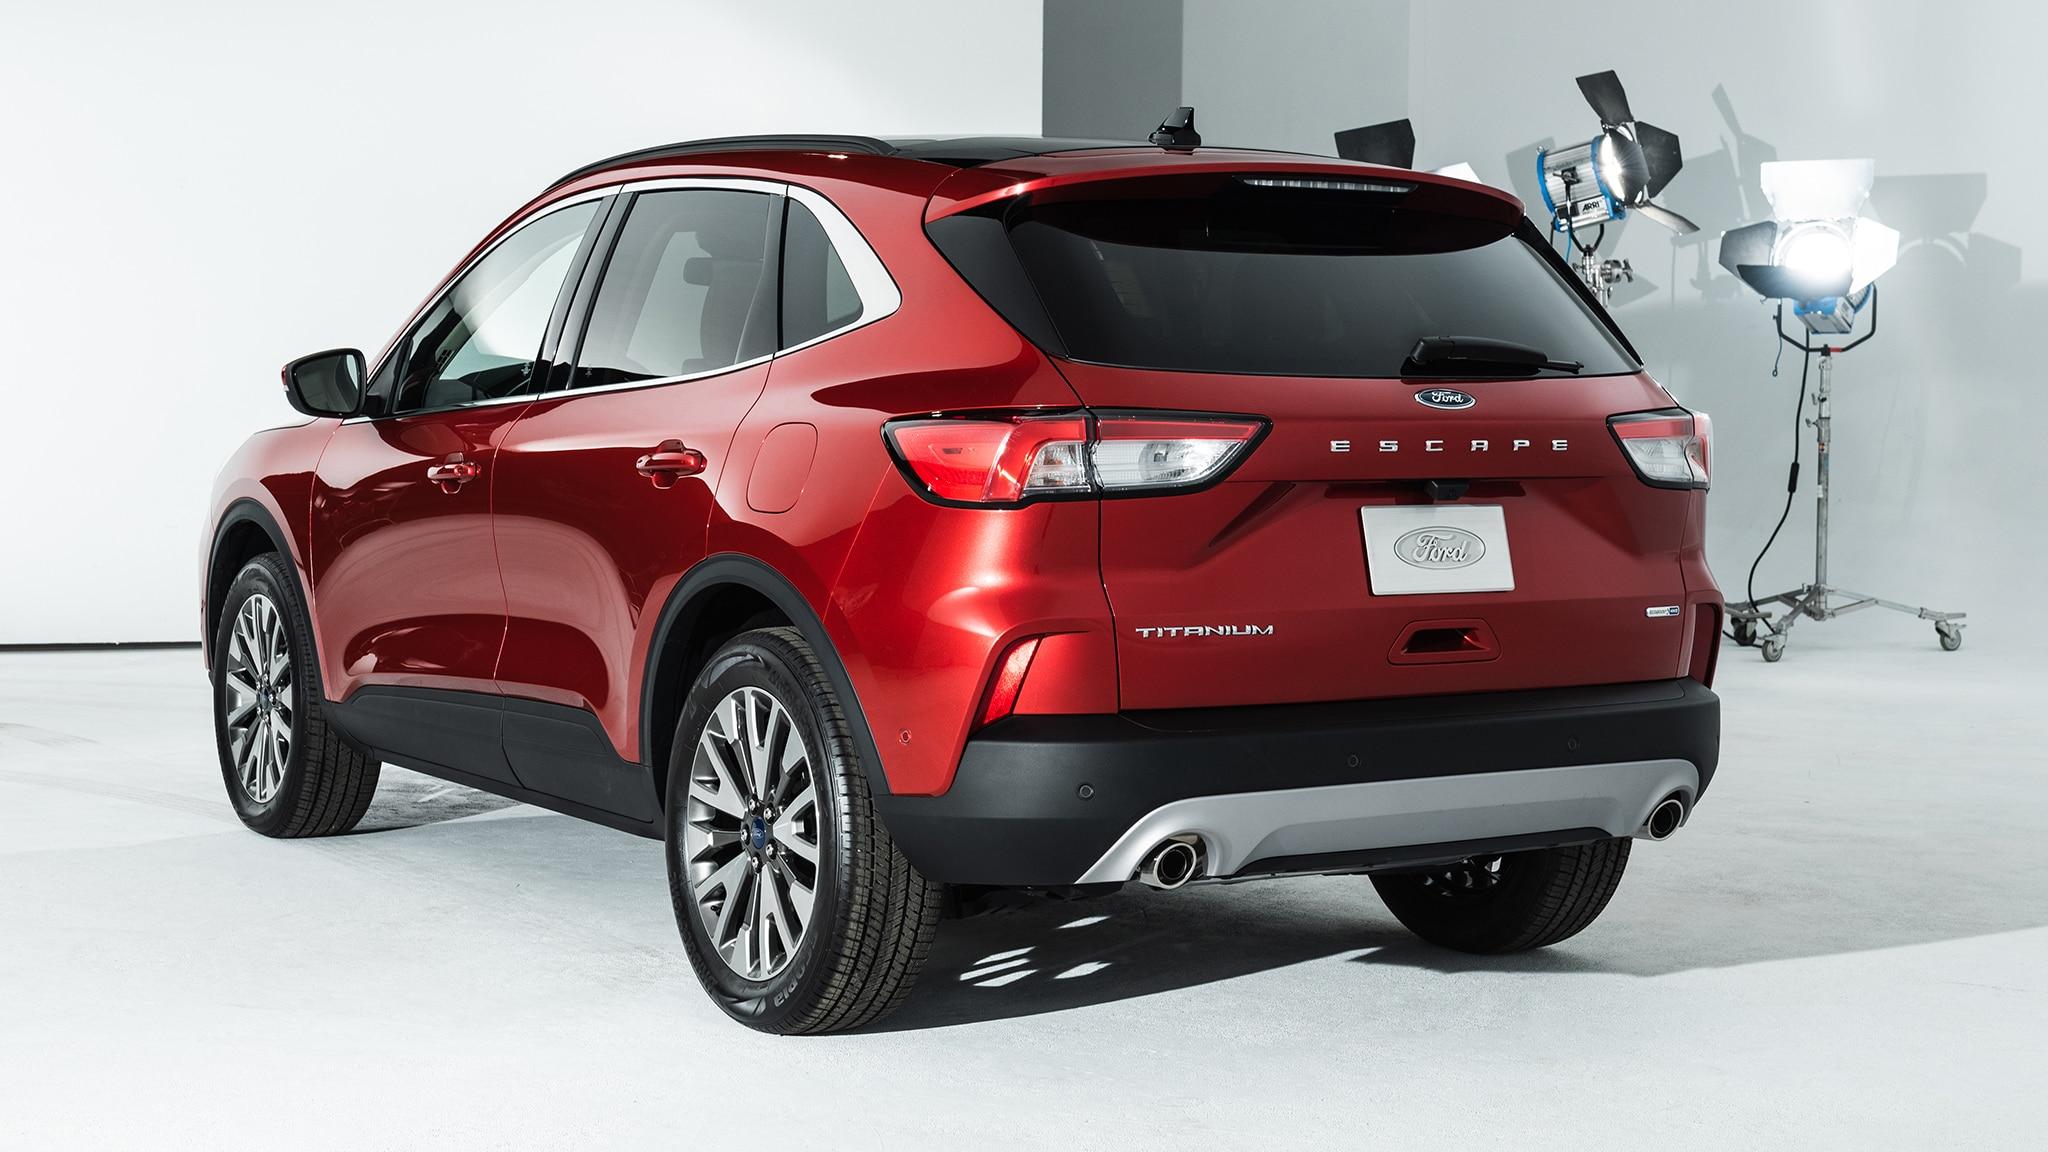 2020 Ford Escape: What We Know | Automobile Magazine